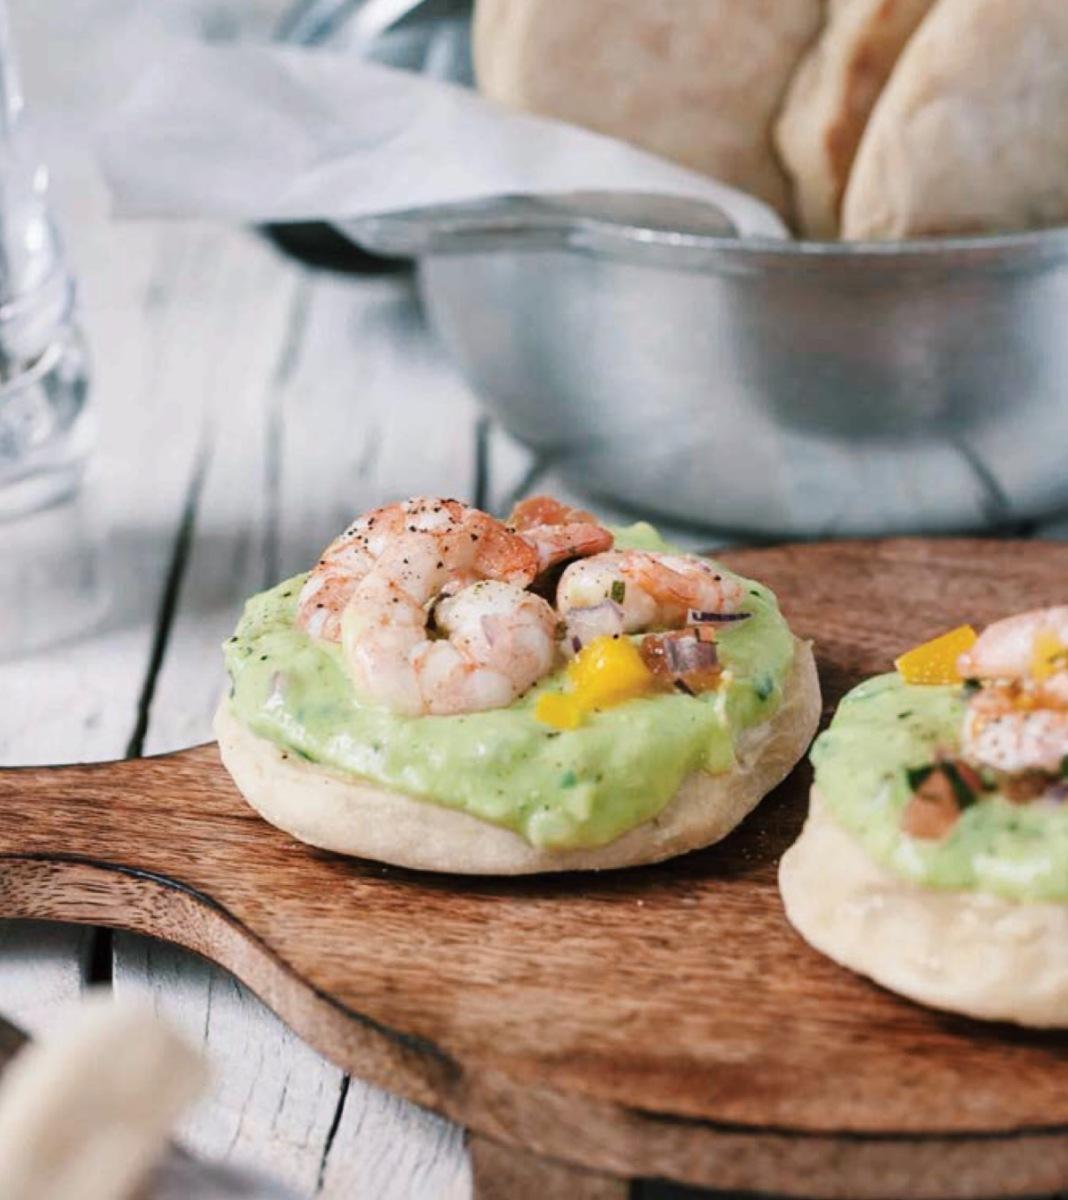 Bruschetta de ceviche de camarão e guacamole | brunch?!